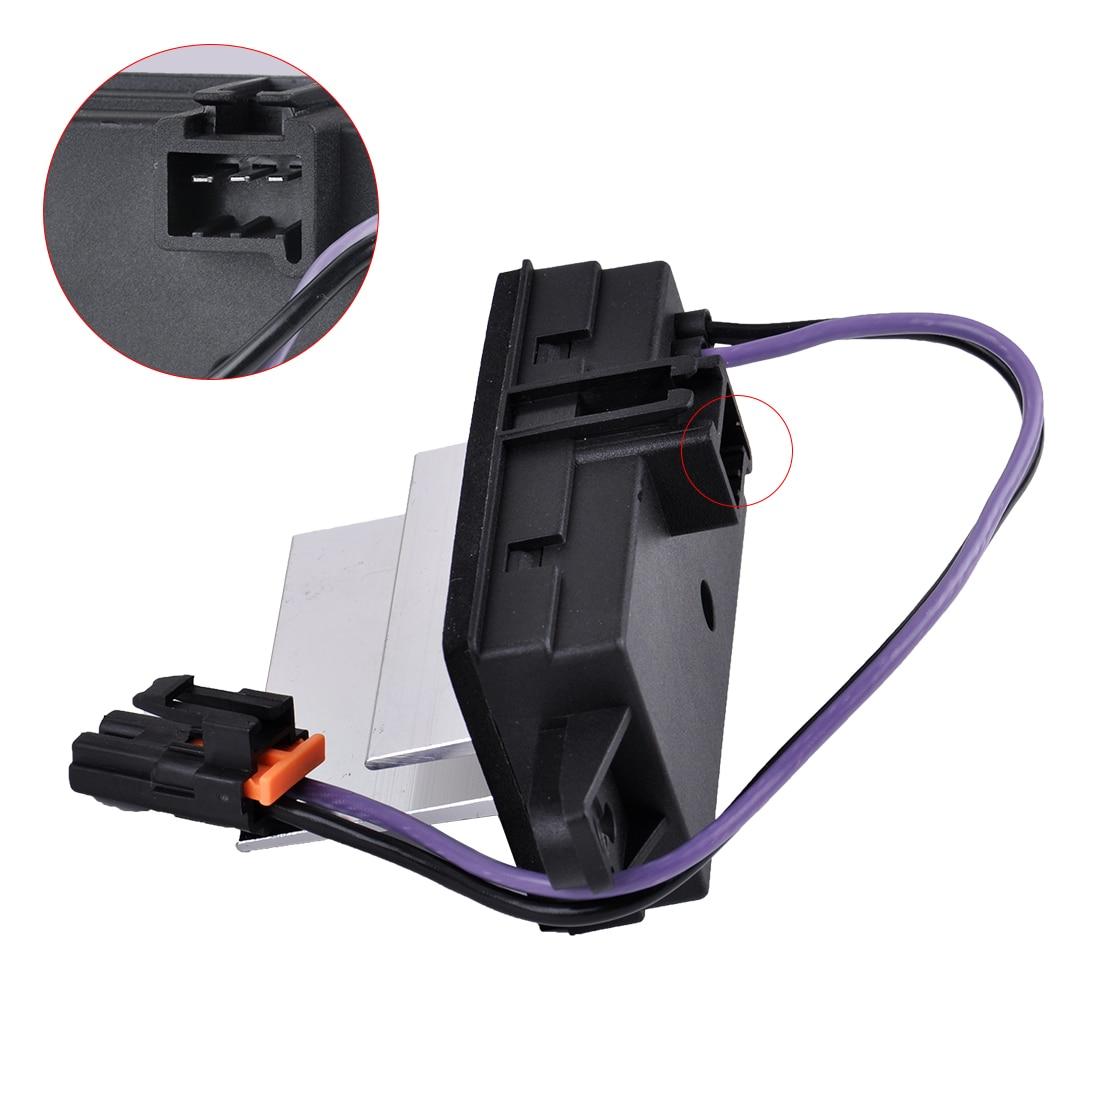 Dwcx Car Hvac Heat Blower Motor Resistor 4p1516 89018778 For 2004 Chevrolet Avalanche Wiring Plug Door Trailblazer Cadillac Escalade Buick Rainier In Air Conditioning